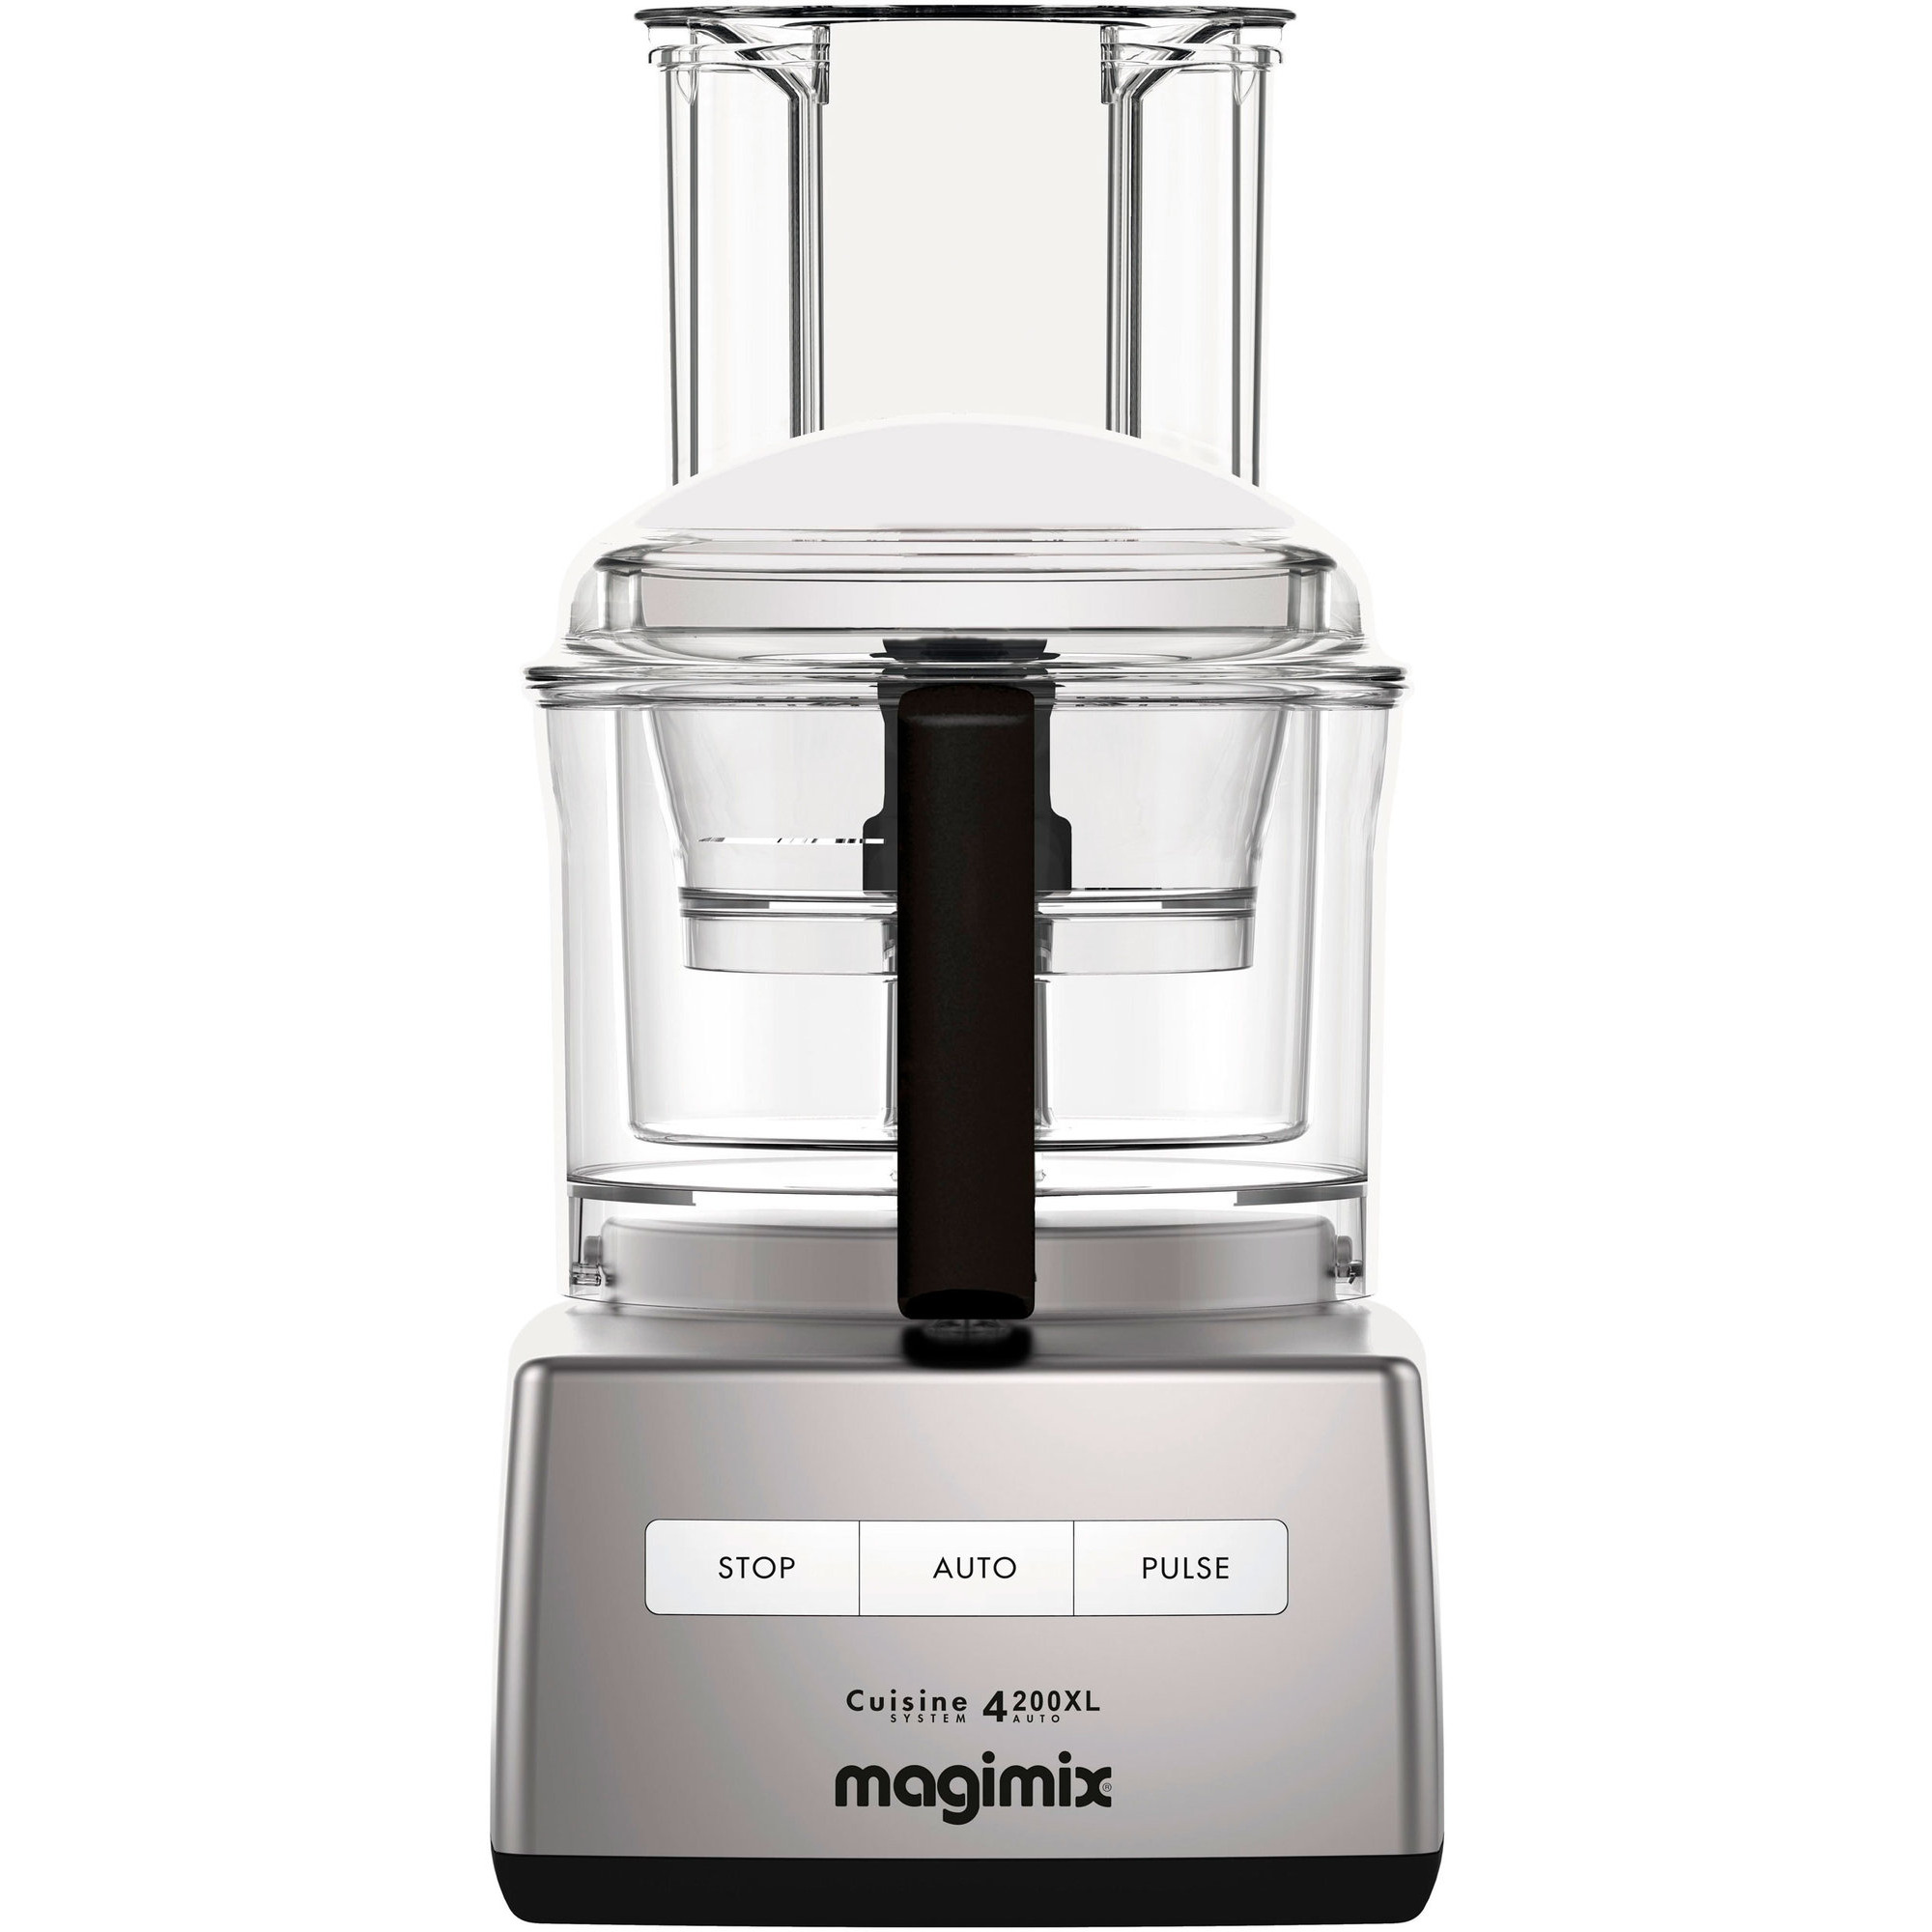 Magimix CS 4200 XL Matberedare Matt Krom